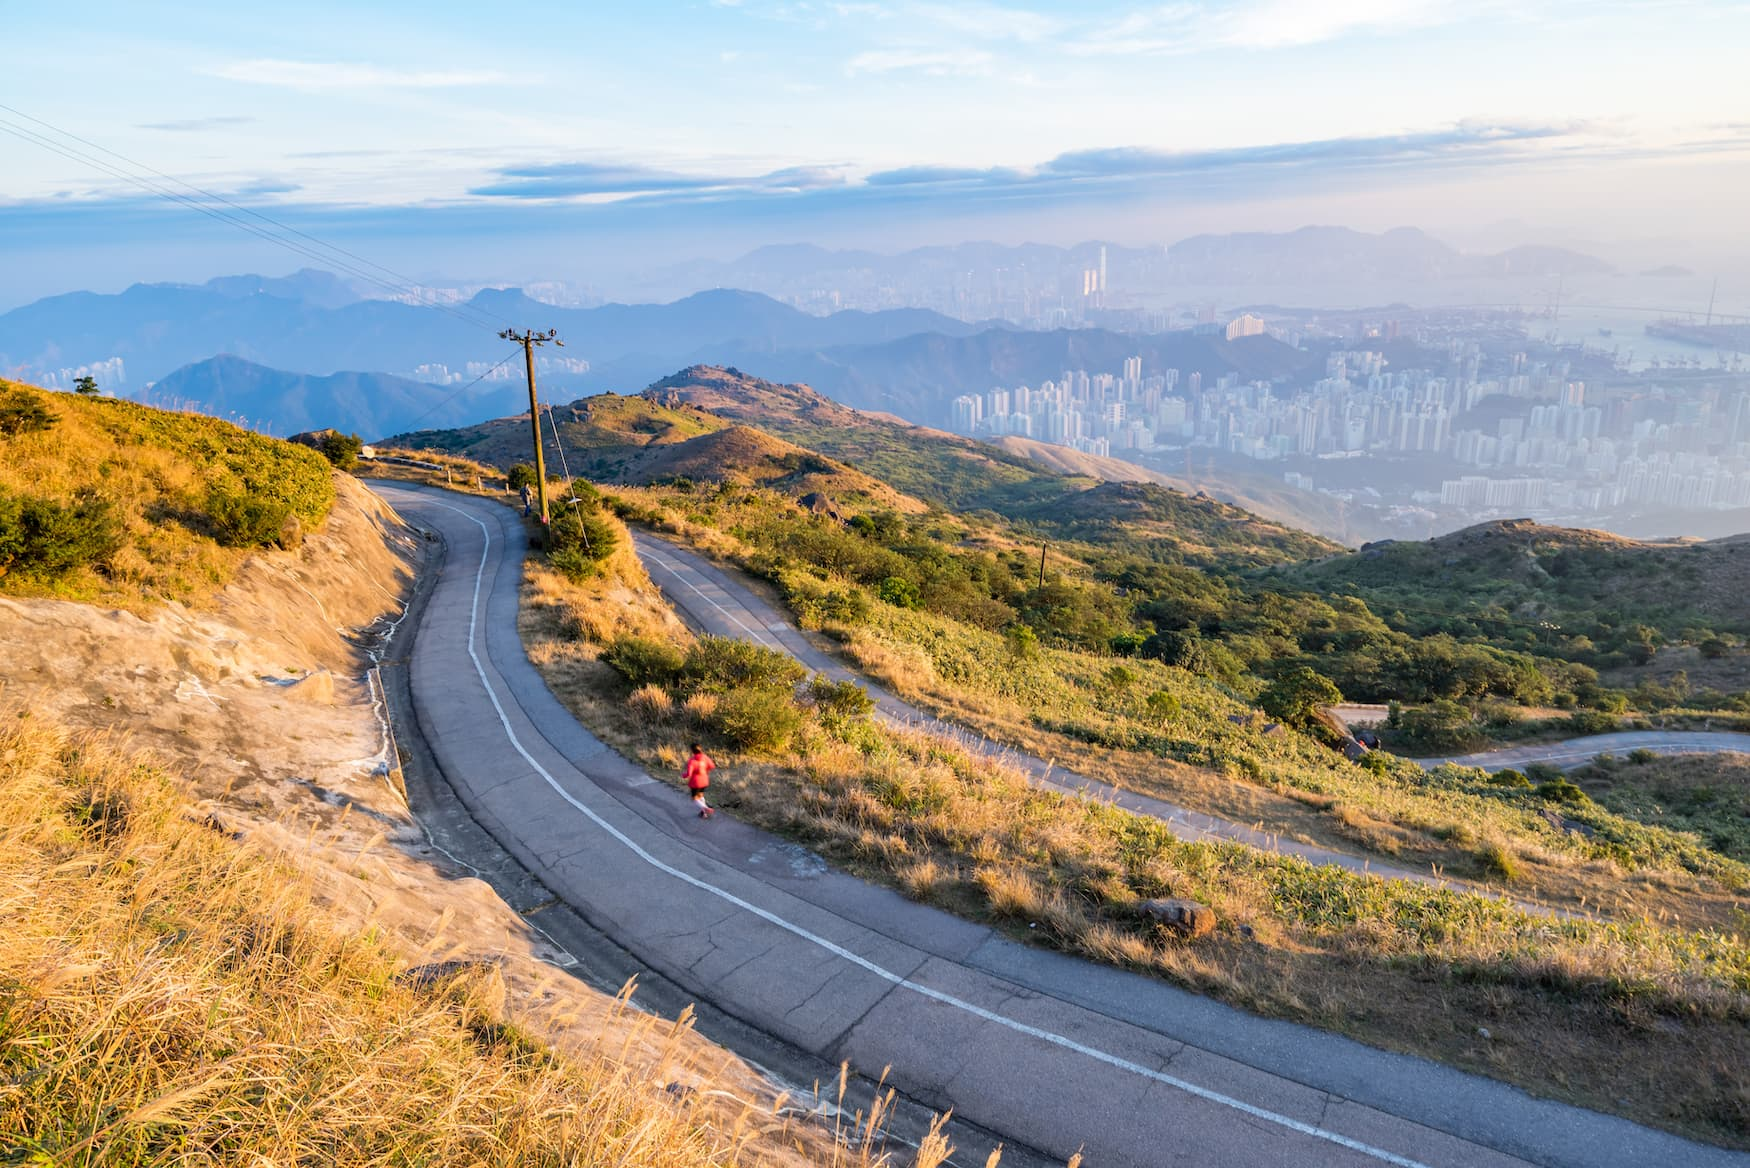 Urlaub mit dem Rad: Auf den höchsten Berg Hongkongs, den Tai Mo Shan